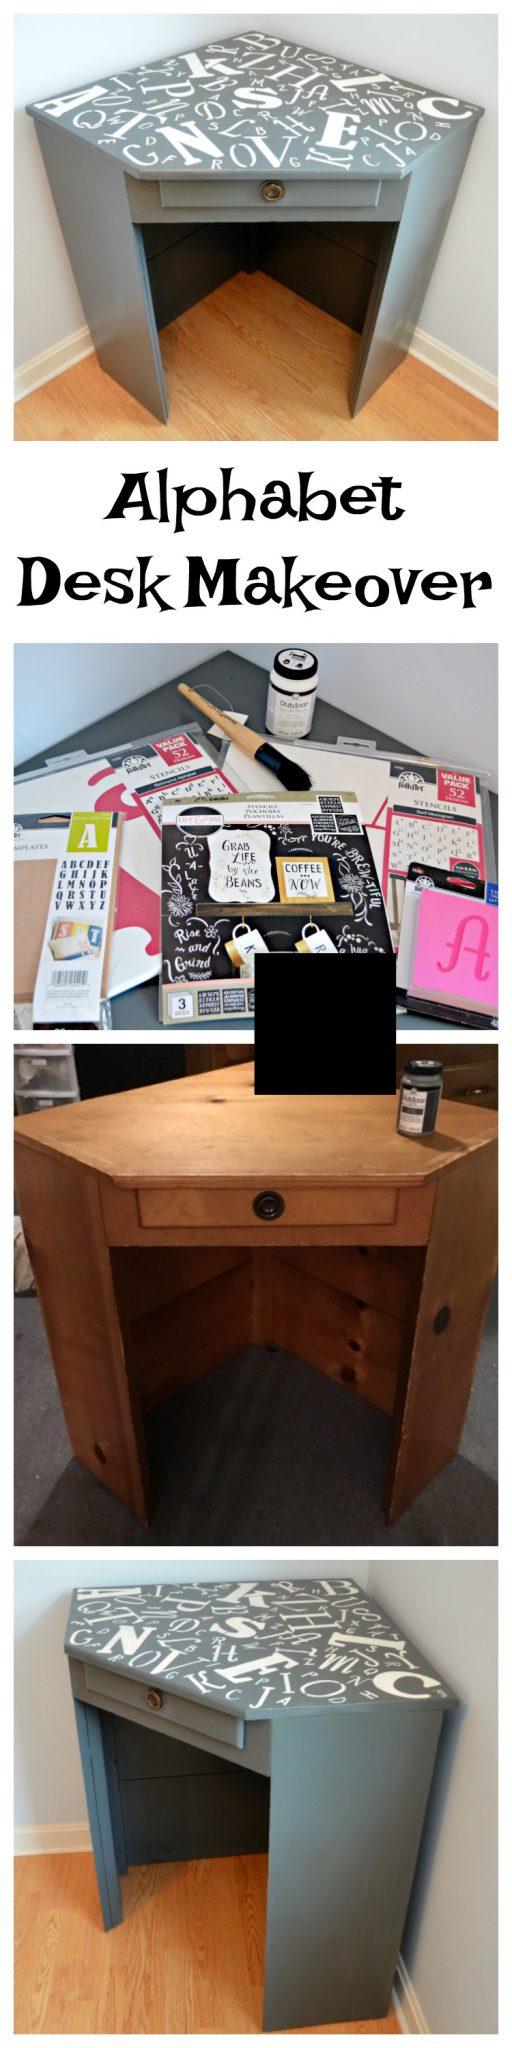 Alphabet Corner Desk Makover: Painted Furniture with Stencils